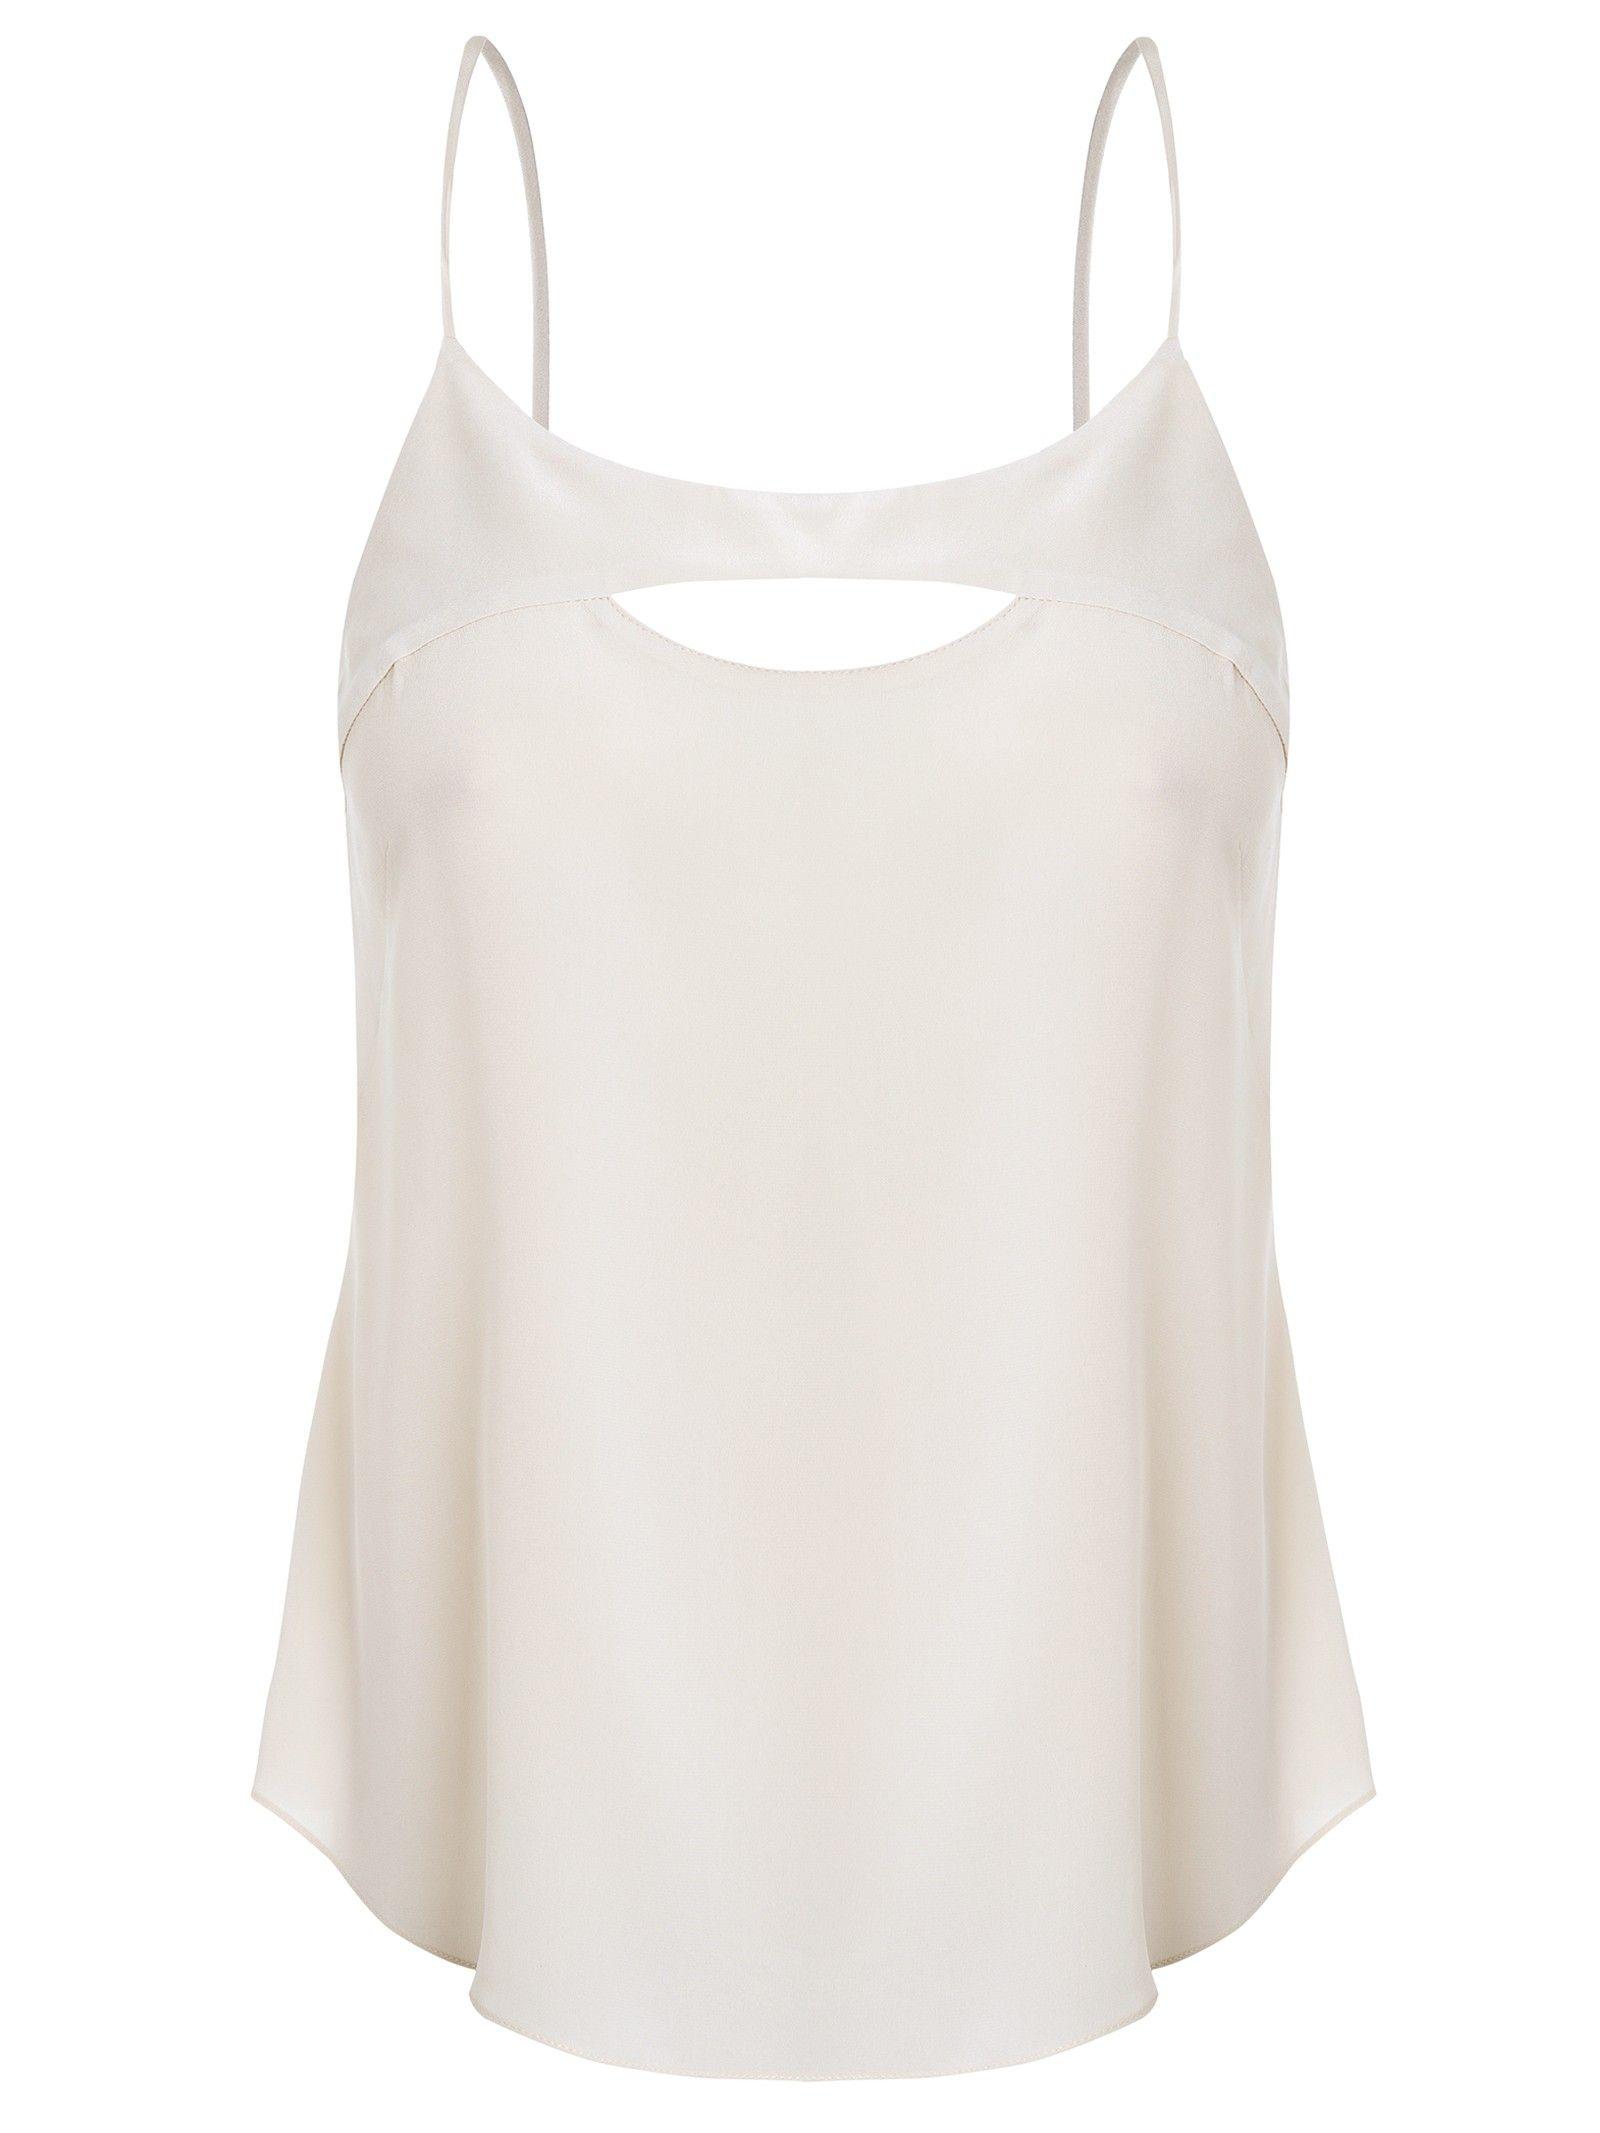 0cbb996705 Blusa Feminina Seda Alça Abertura Decote - Animale - Branco - Shop2gether